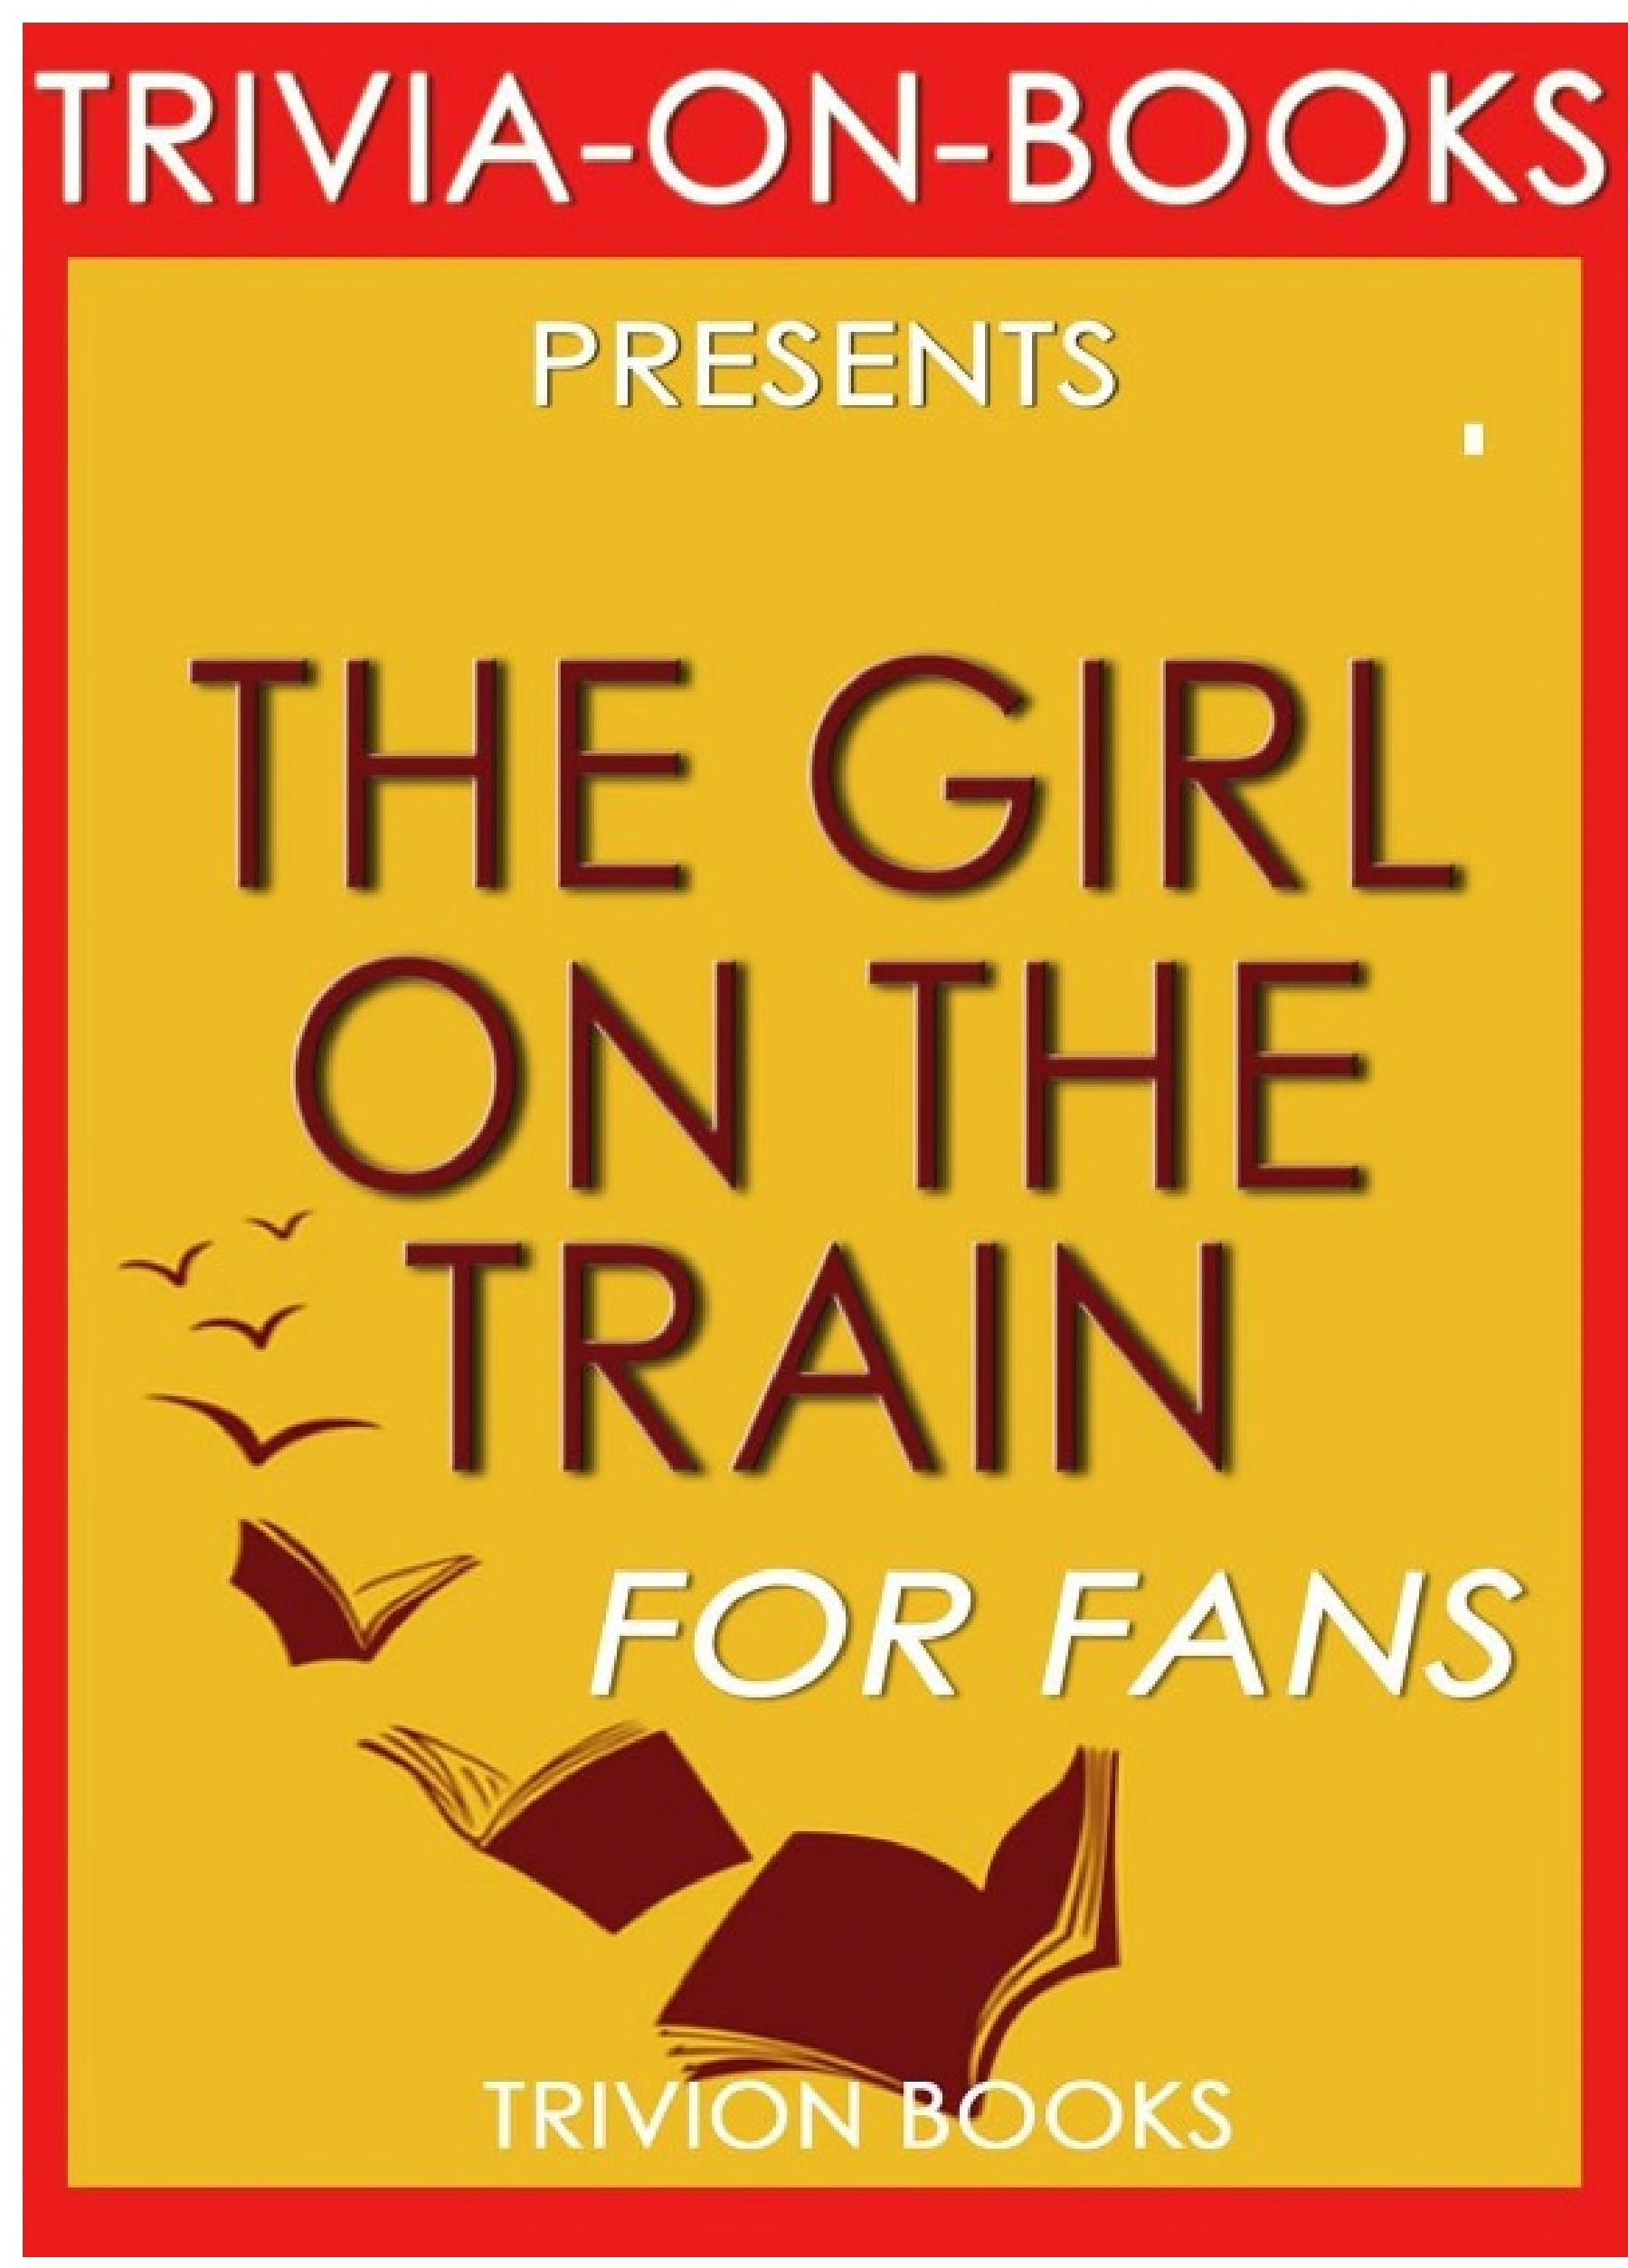 The Girl on the Train  A Novel by Paula Hawkin  Trivia On Books